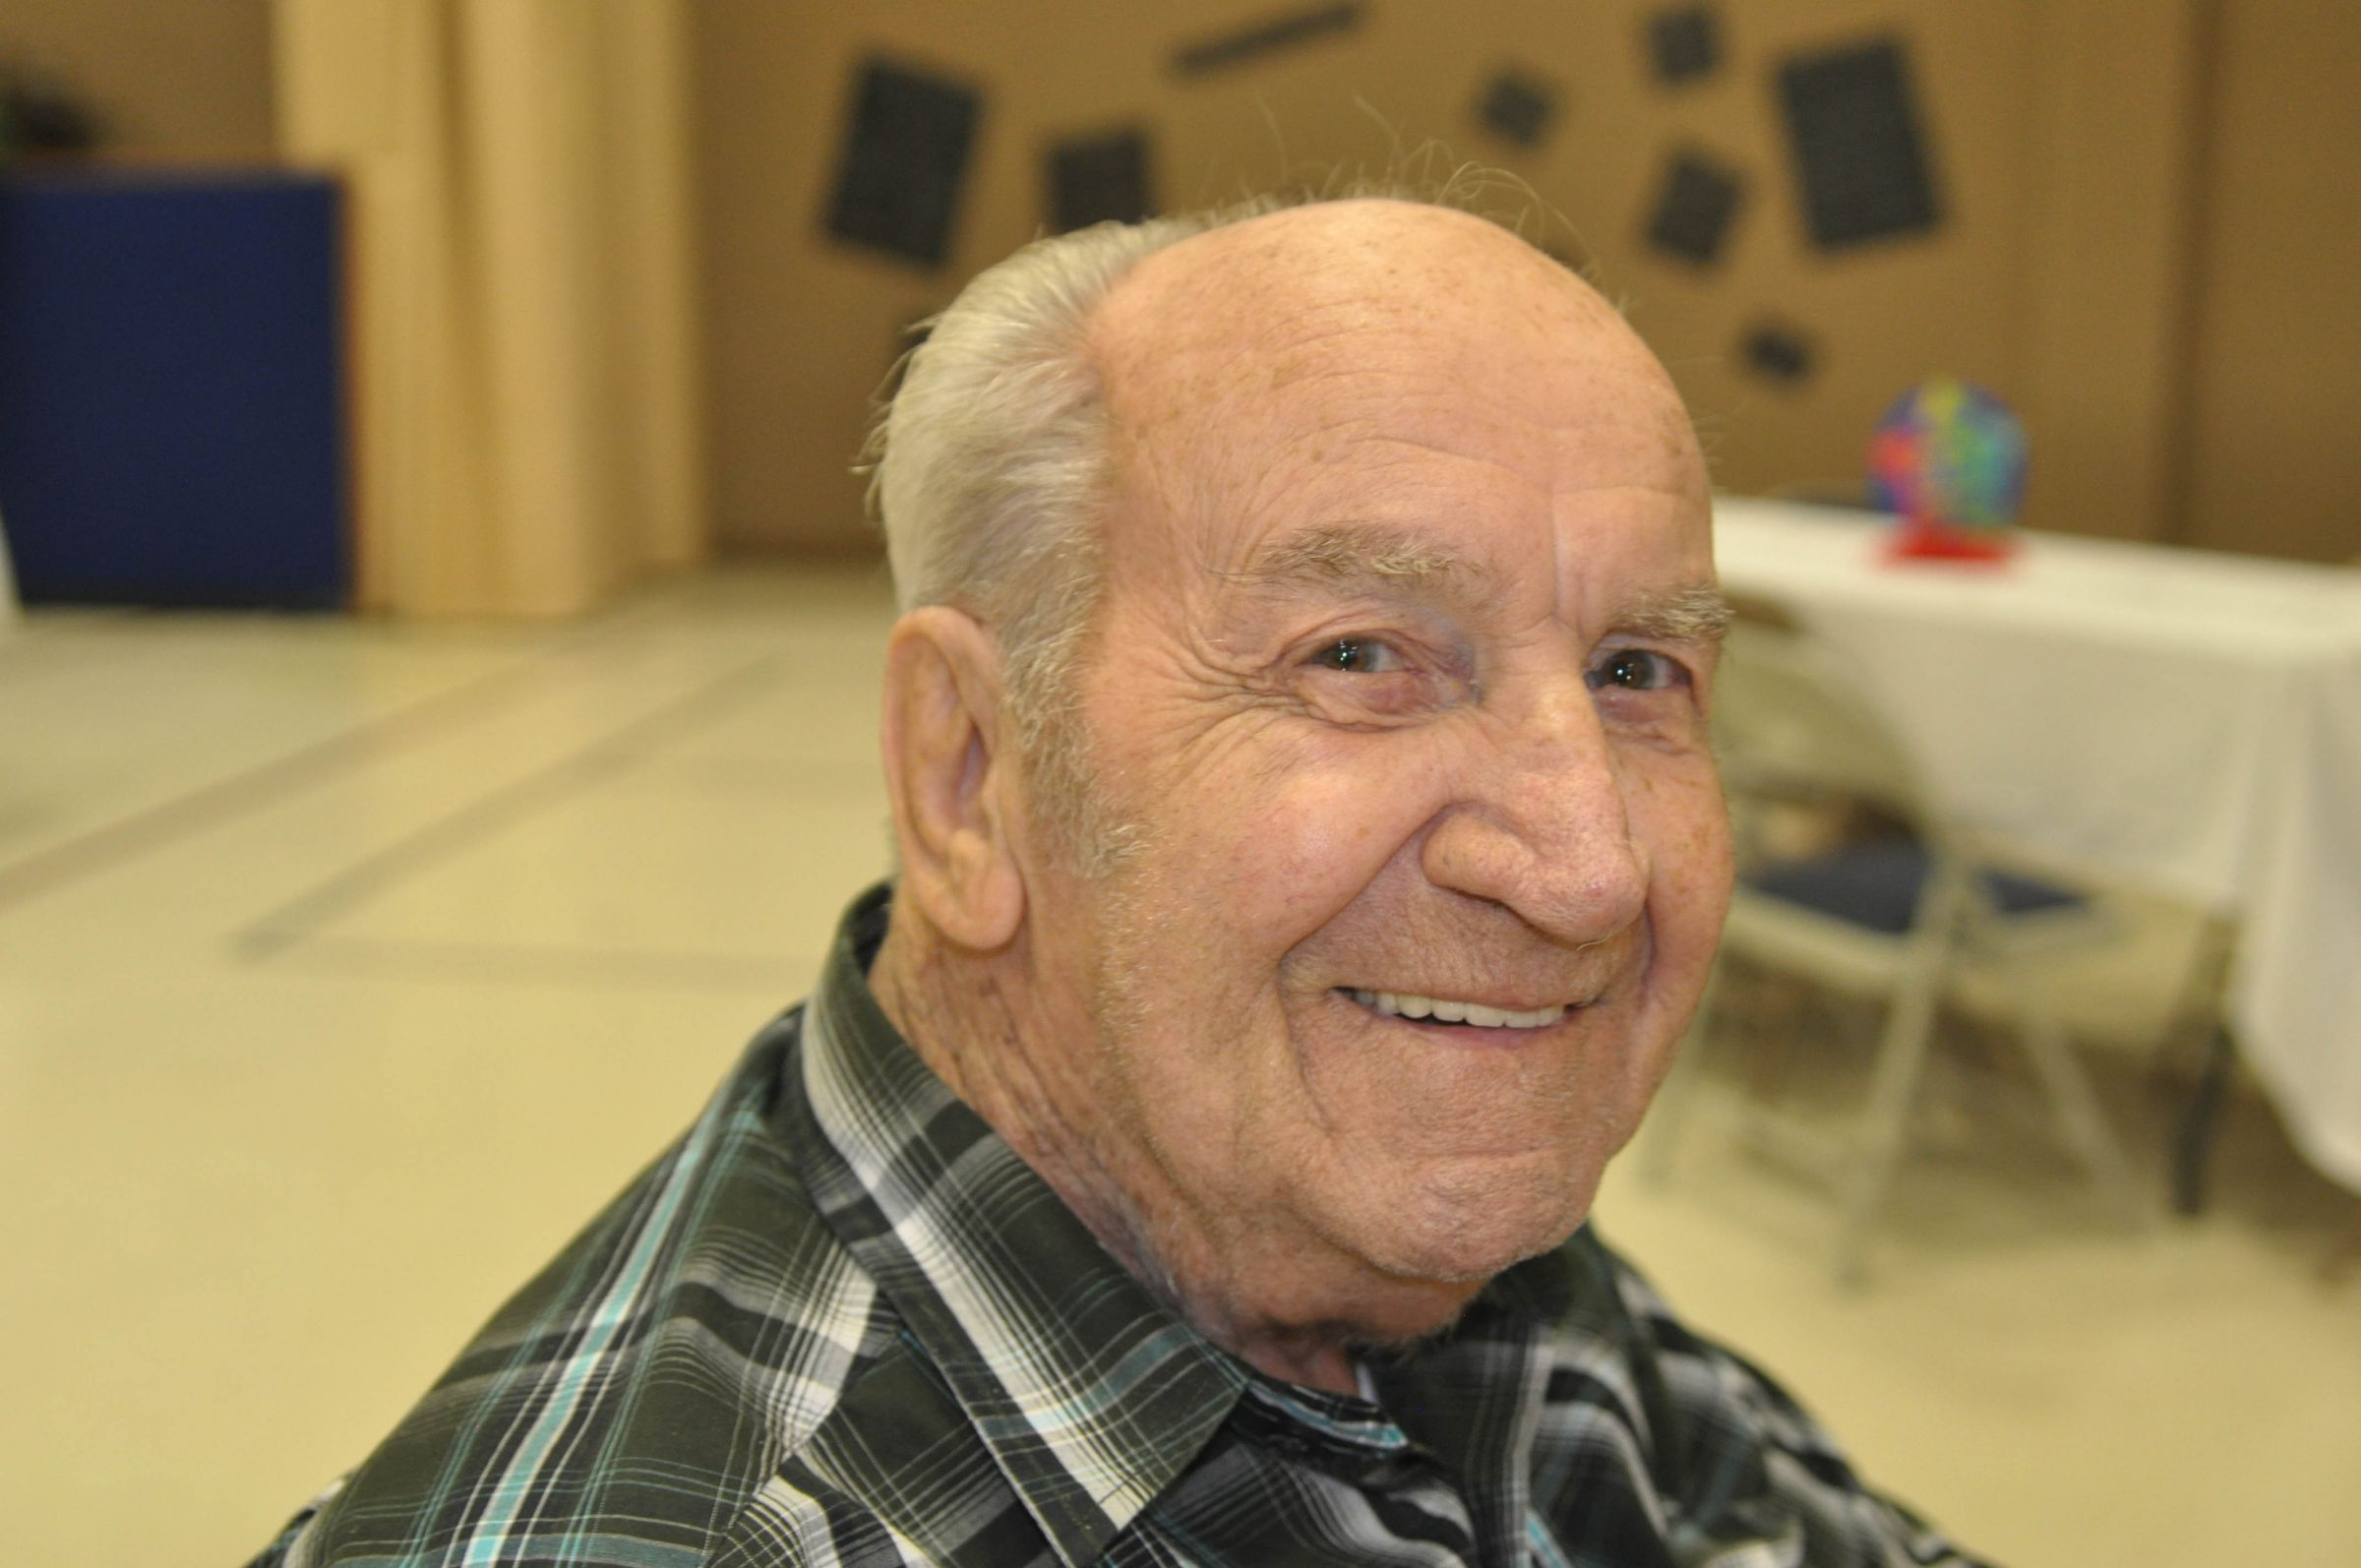 obituaries center broadcasting live local reaching out honorary pallbearers will be jay arnold bobby leonard charlie patton dakota bridge ken cooper and j d weldon